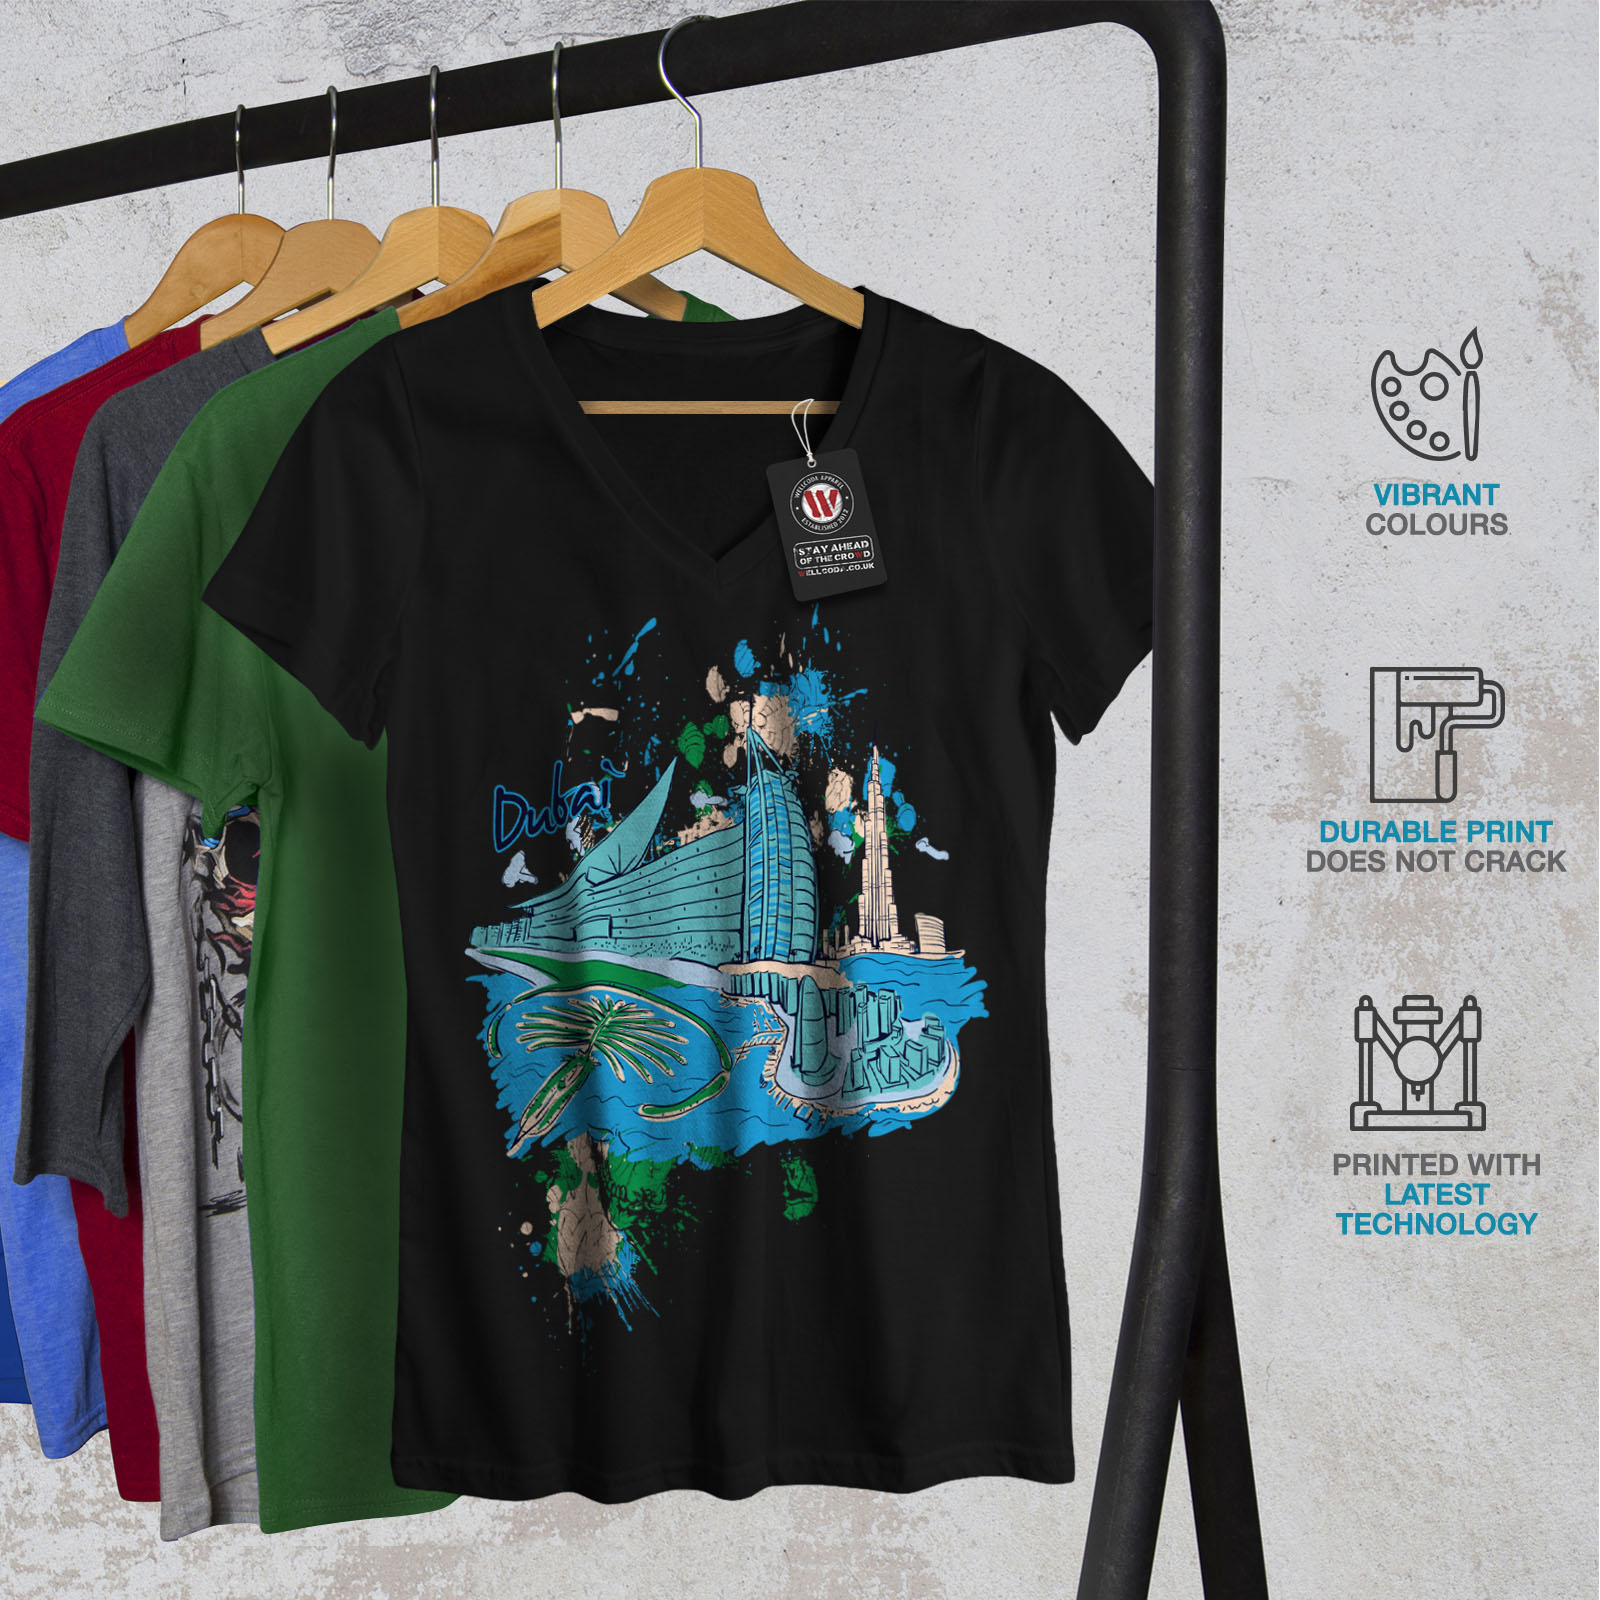 Wellcoda-Dubai-Womens-V-Neck-T-shirt-United-Arab-Graphic-Design-Tee thumbnail 4